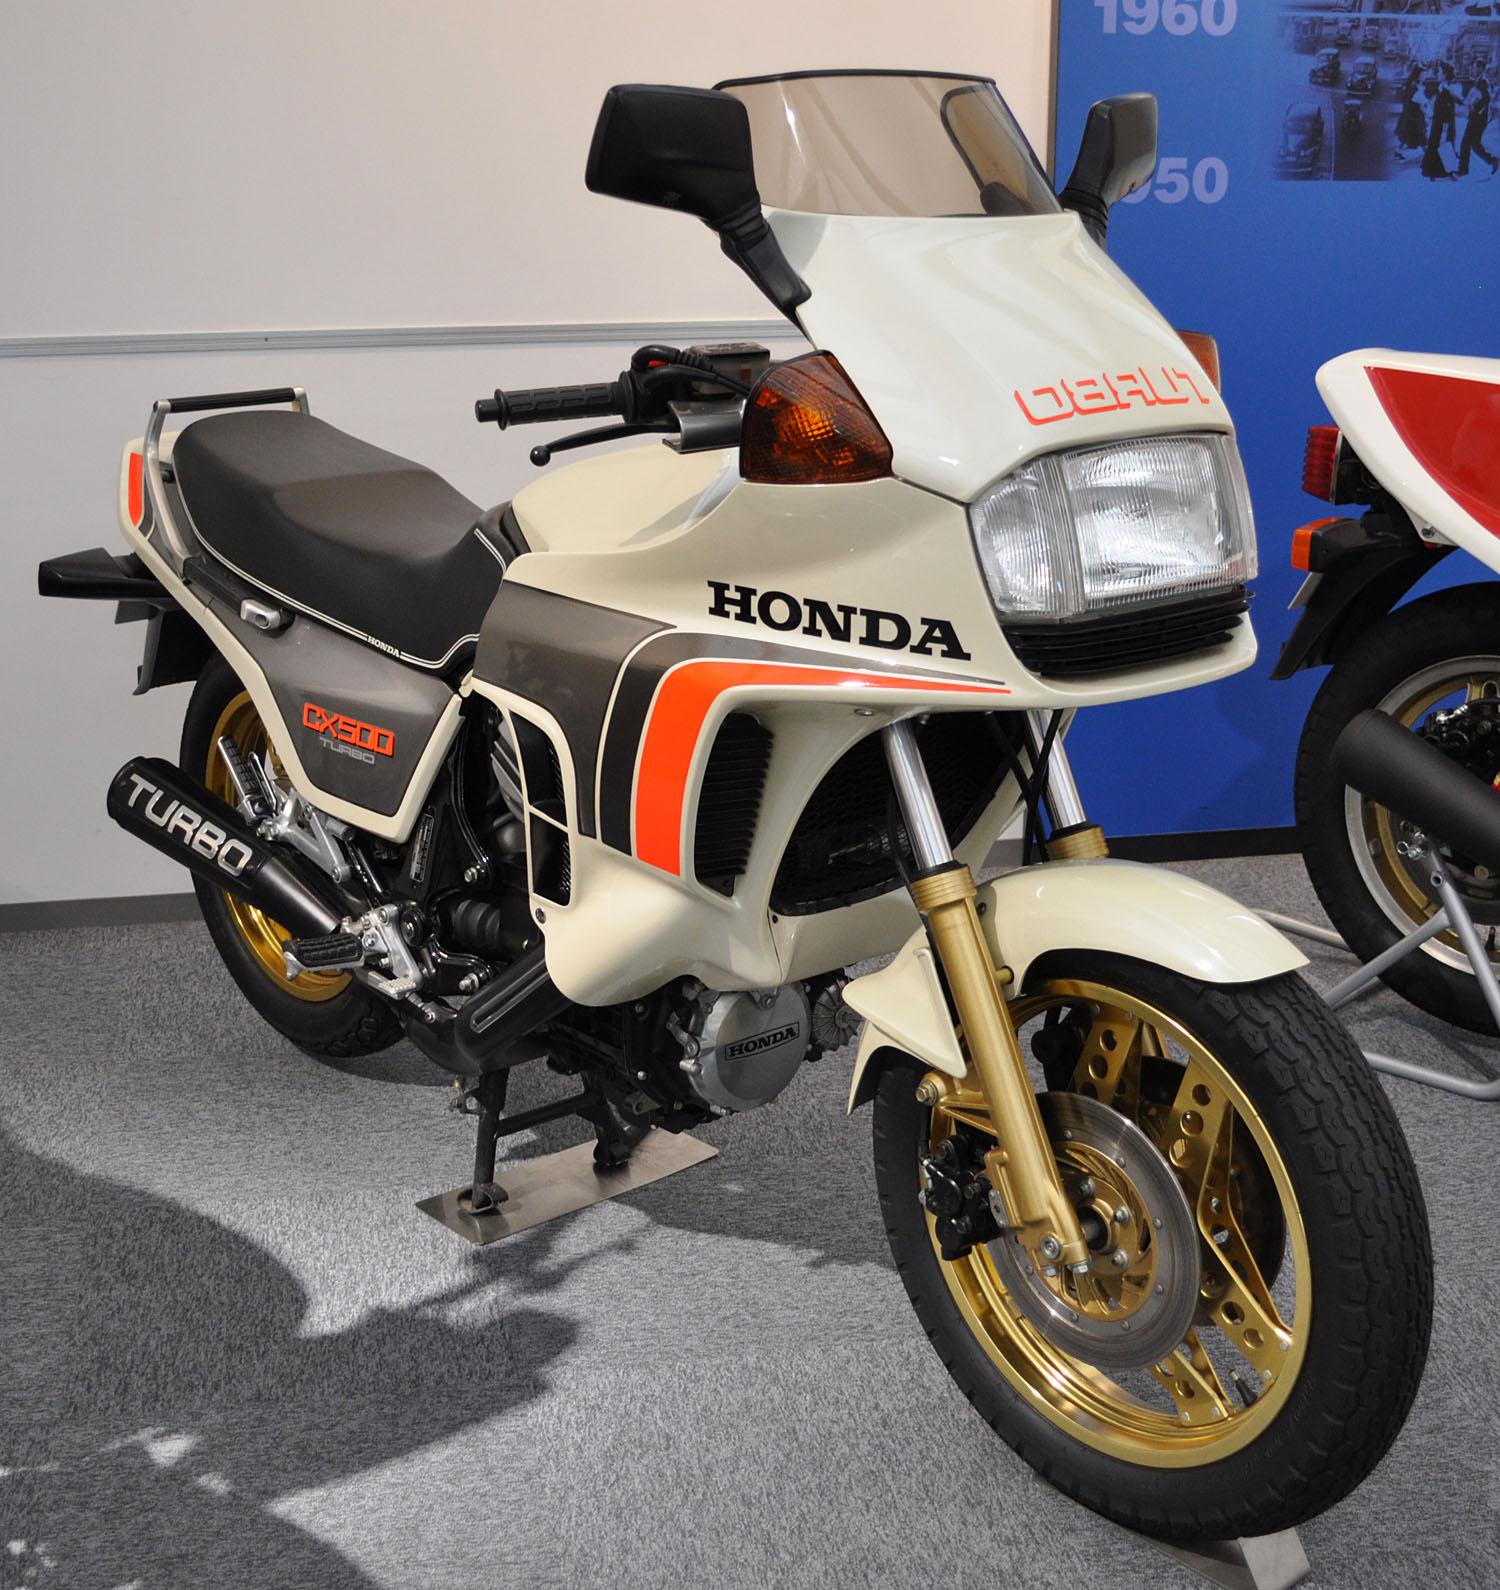 File:Honda CX500 Turbo.jpg - Wikimedia Commons